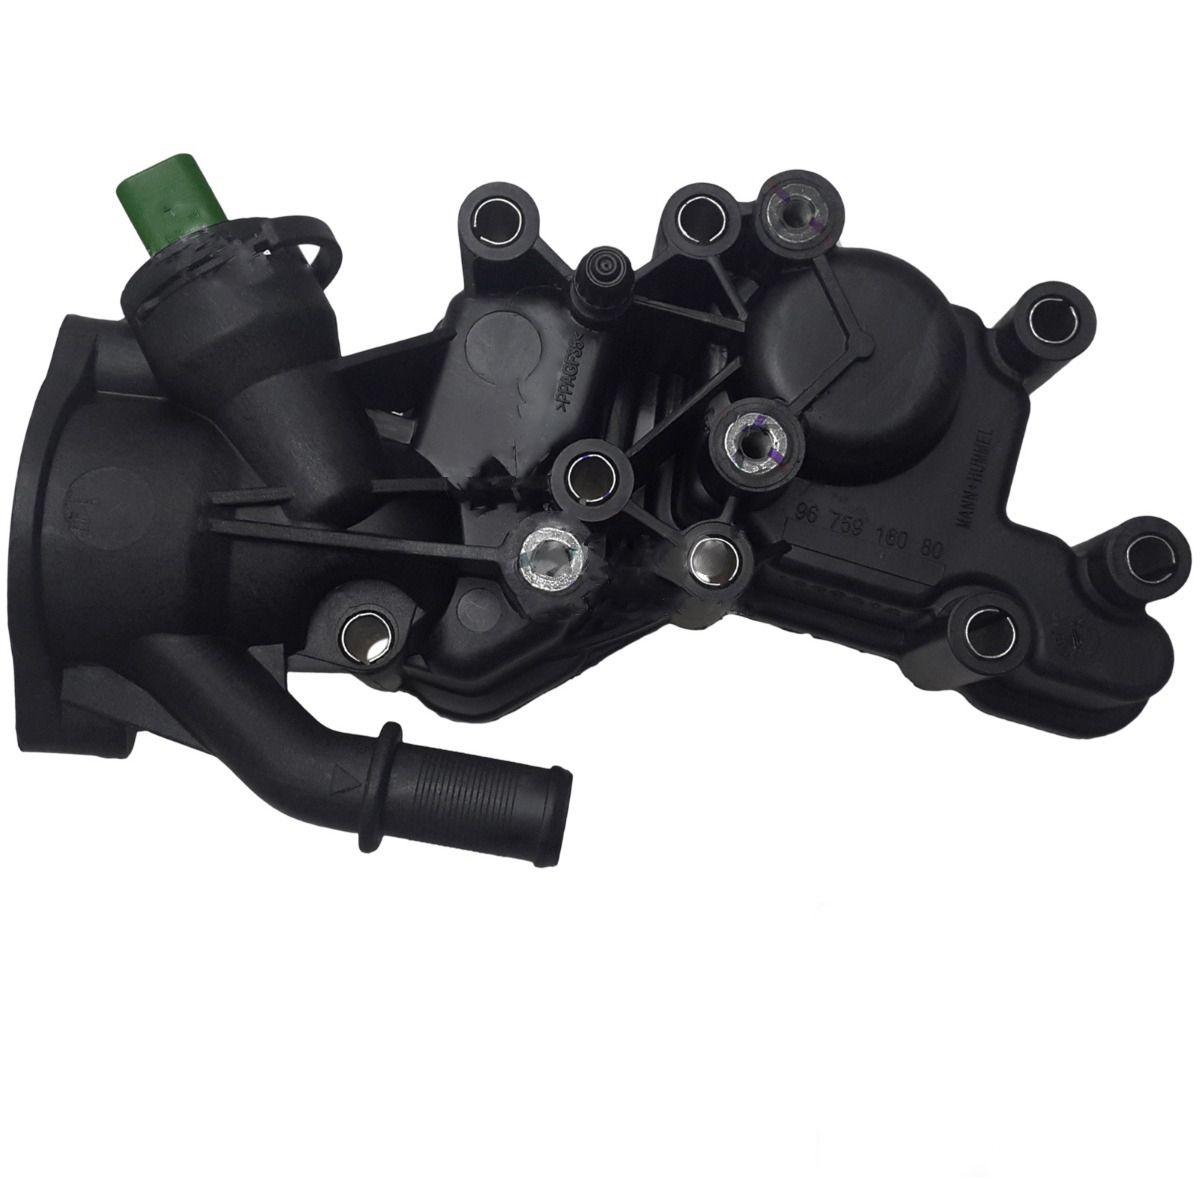 Carcaça de válvula termostática com sensor - Peugeot 208 1.5, Citroën C3 1.5